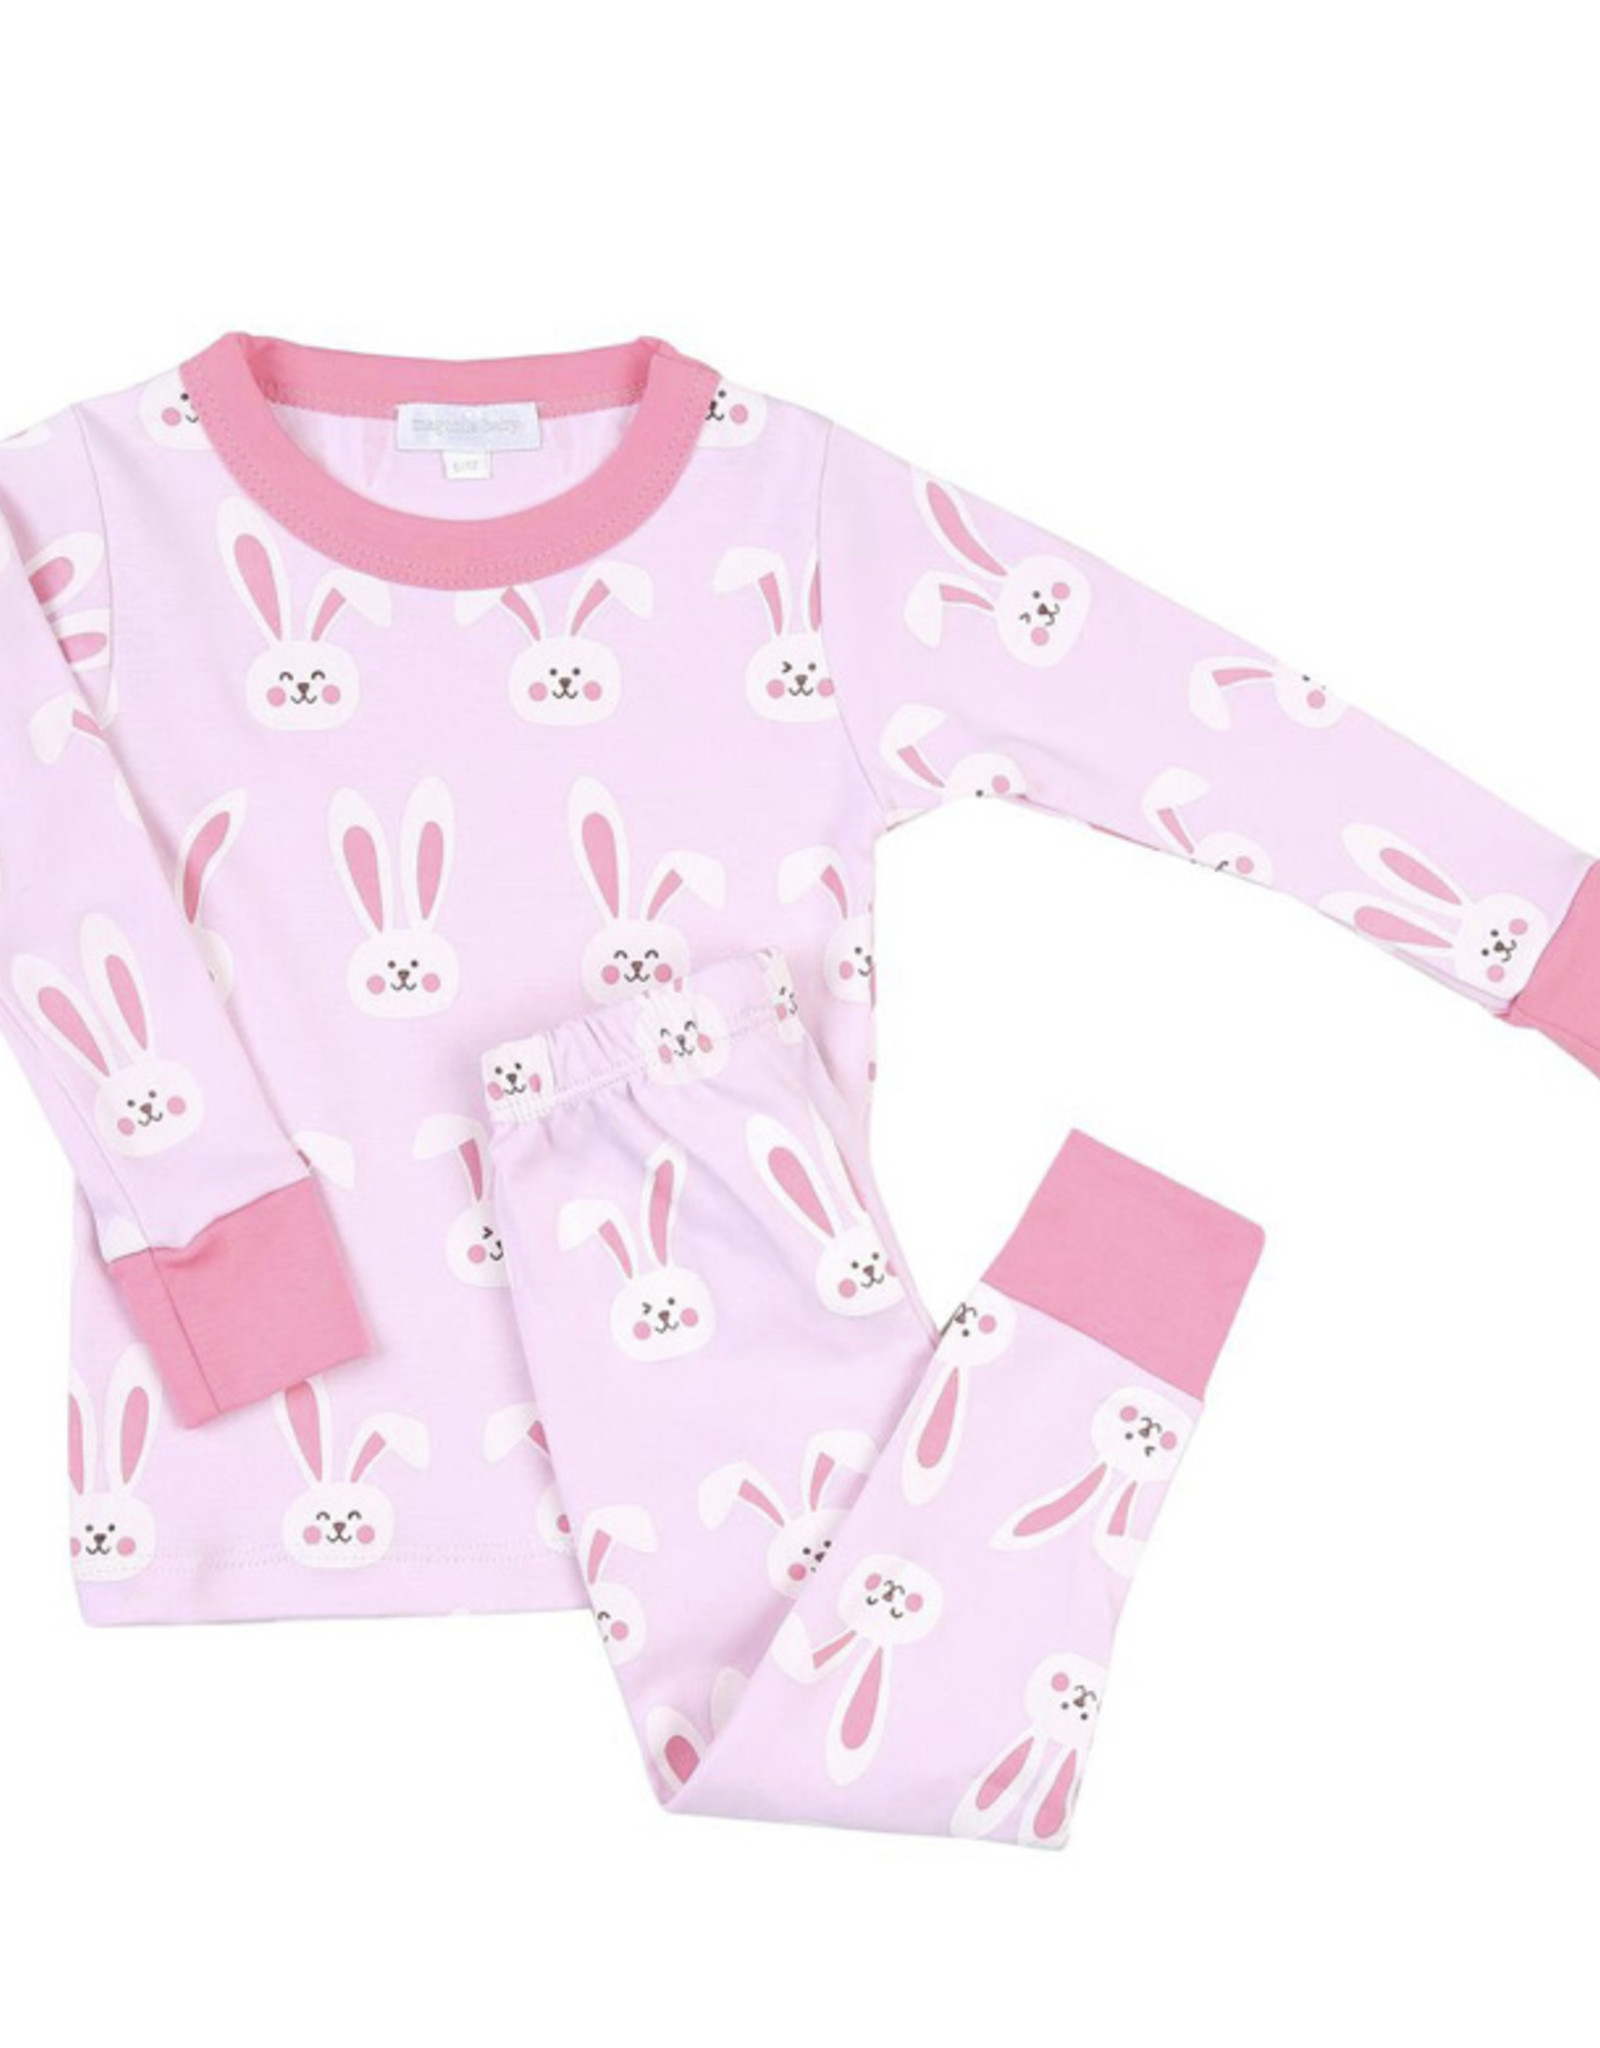 magnolia baby Bunny Pajamas